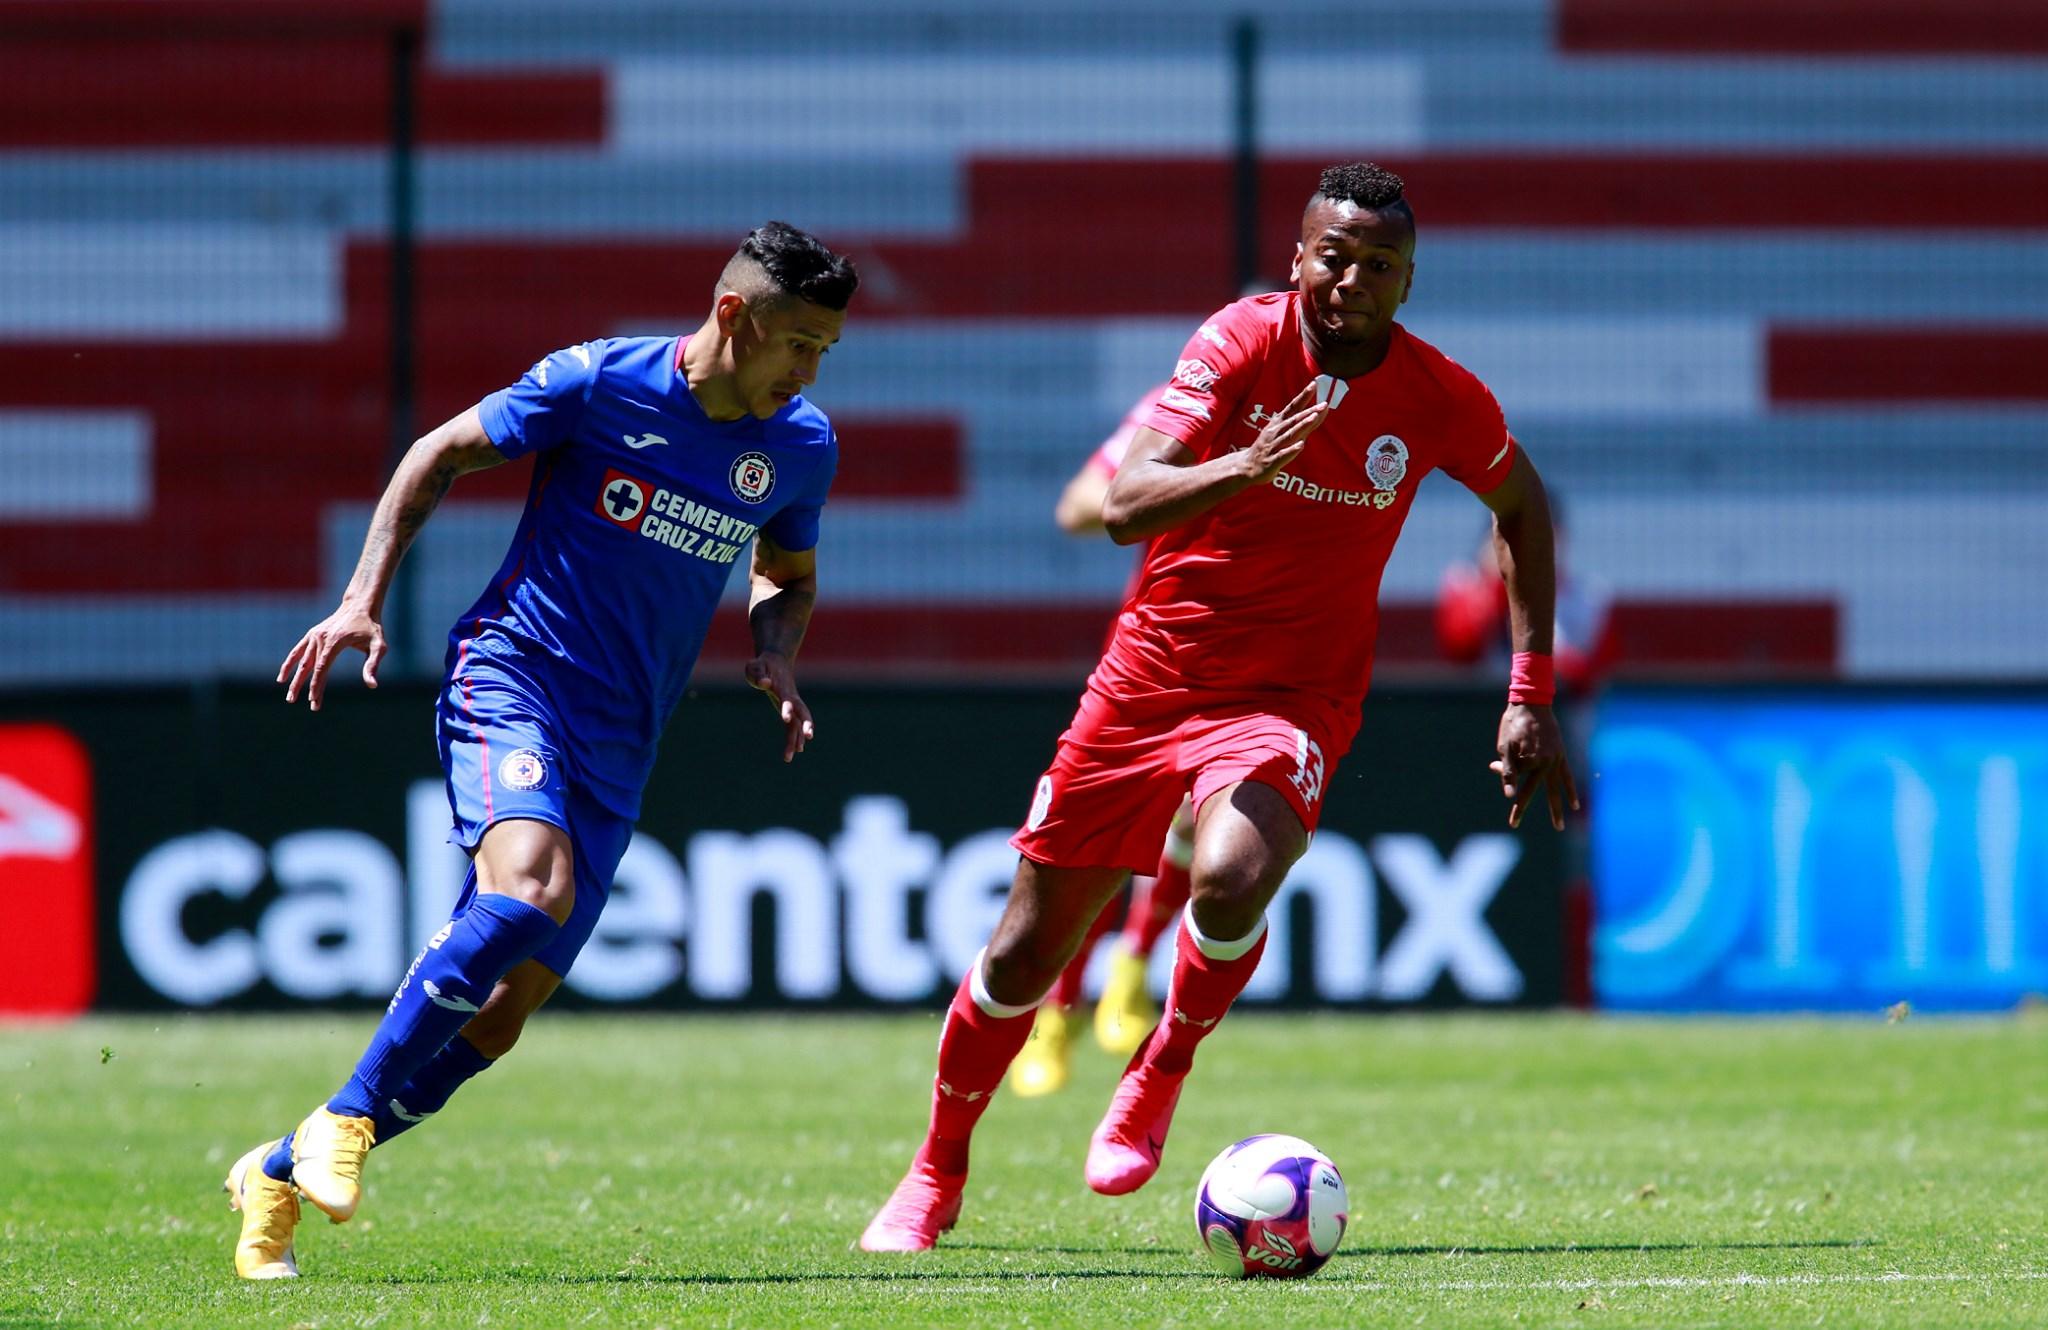 Toluca FC gana en el Nemesio Diez ante Cruz Azul